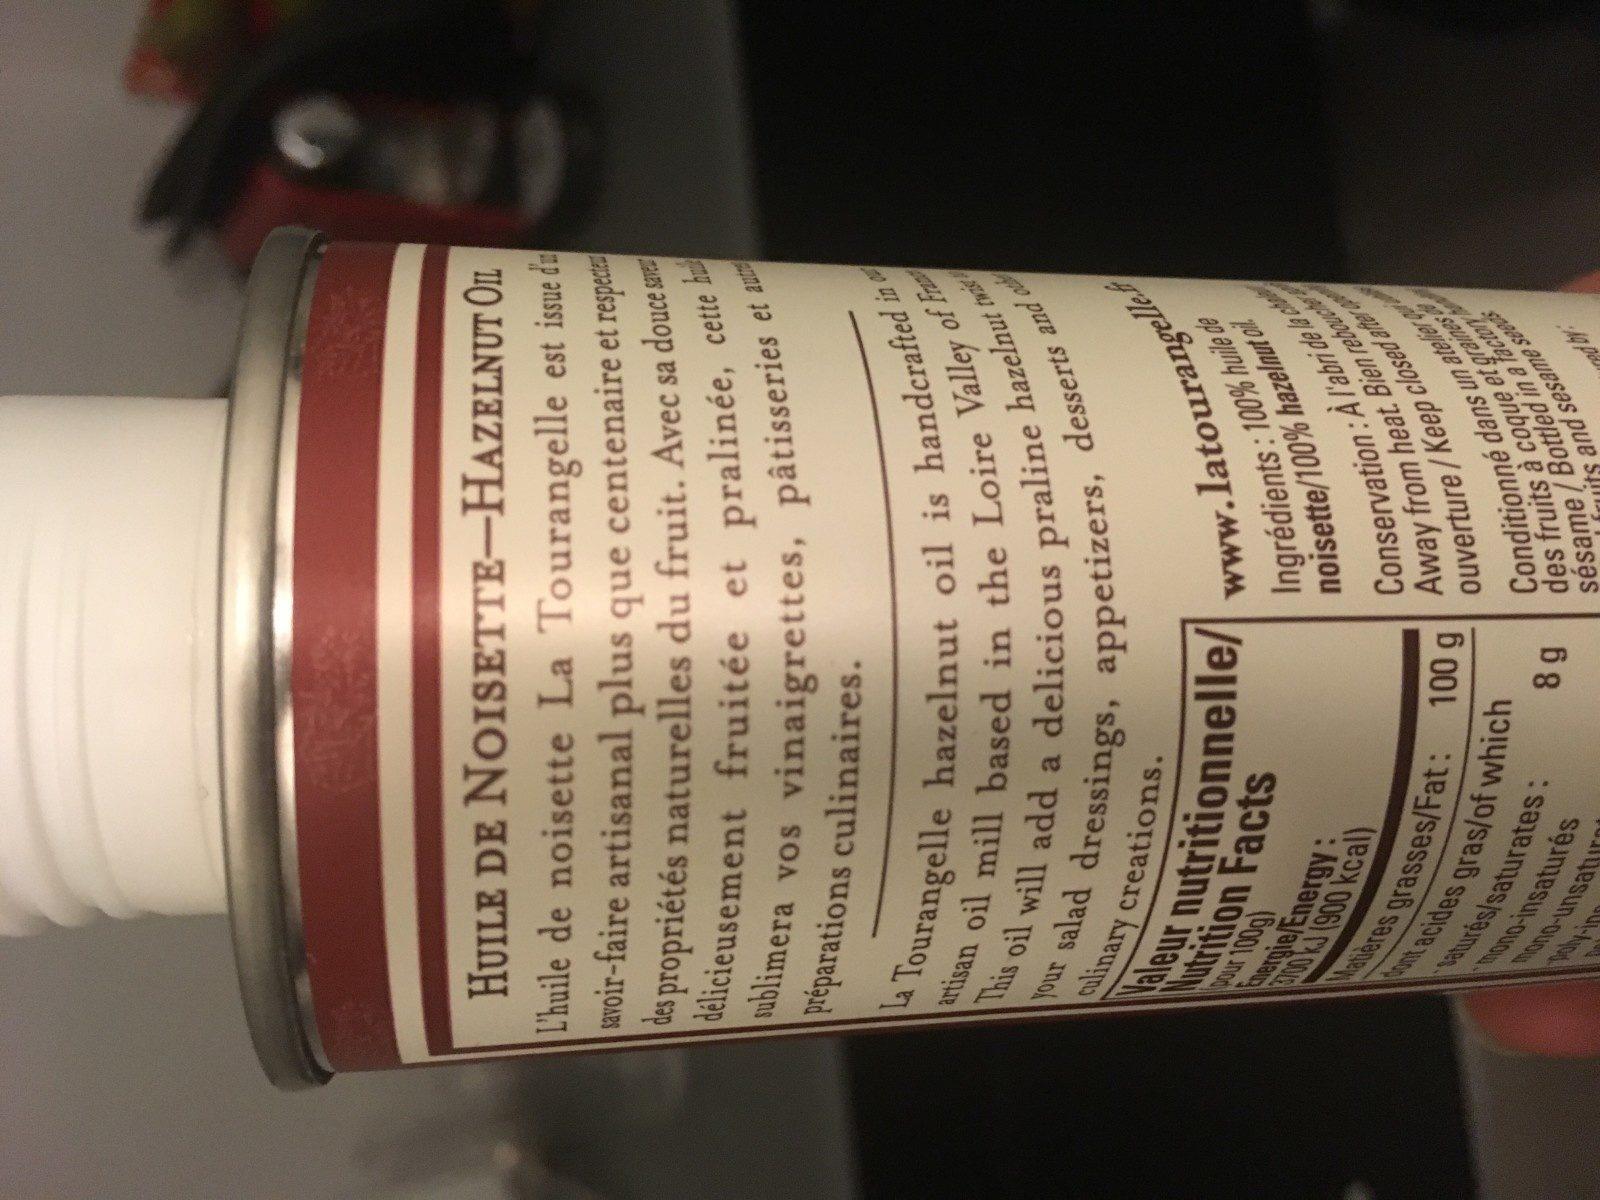 Huile de noisette - Ingredients - fr